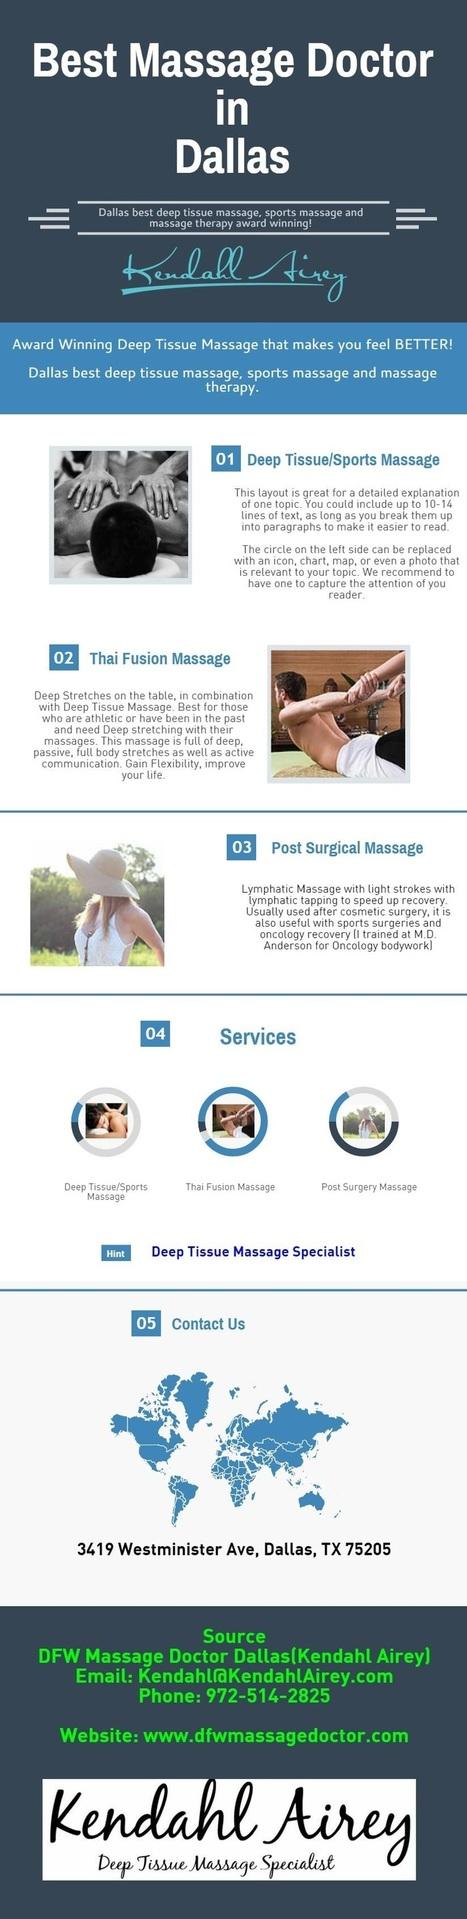 Best Massage Specialist Doctor in Dallas   Healthy Fitness Life   Scoop.it